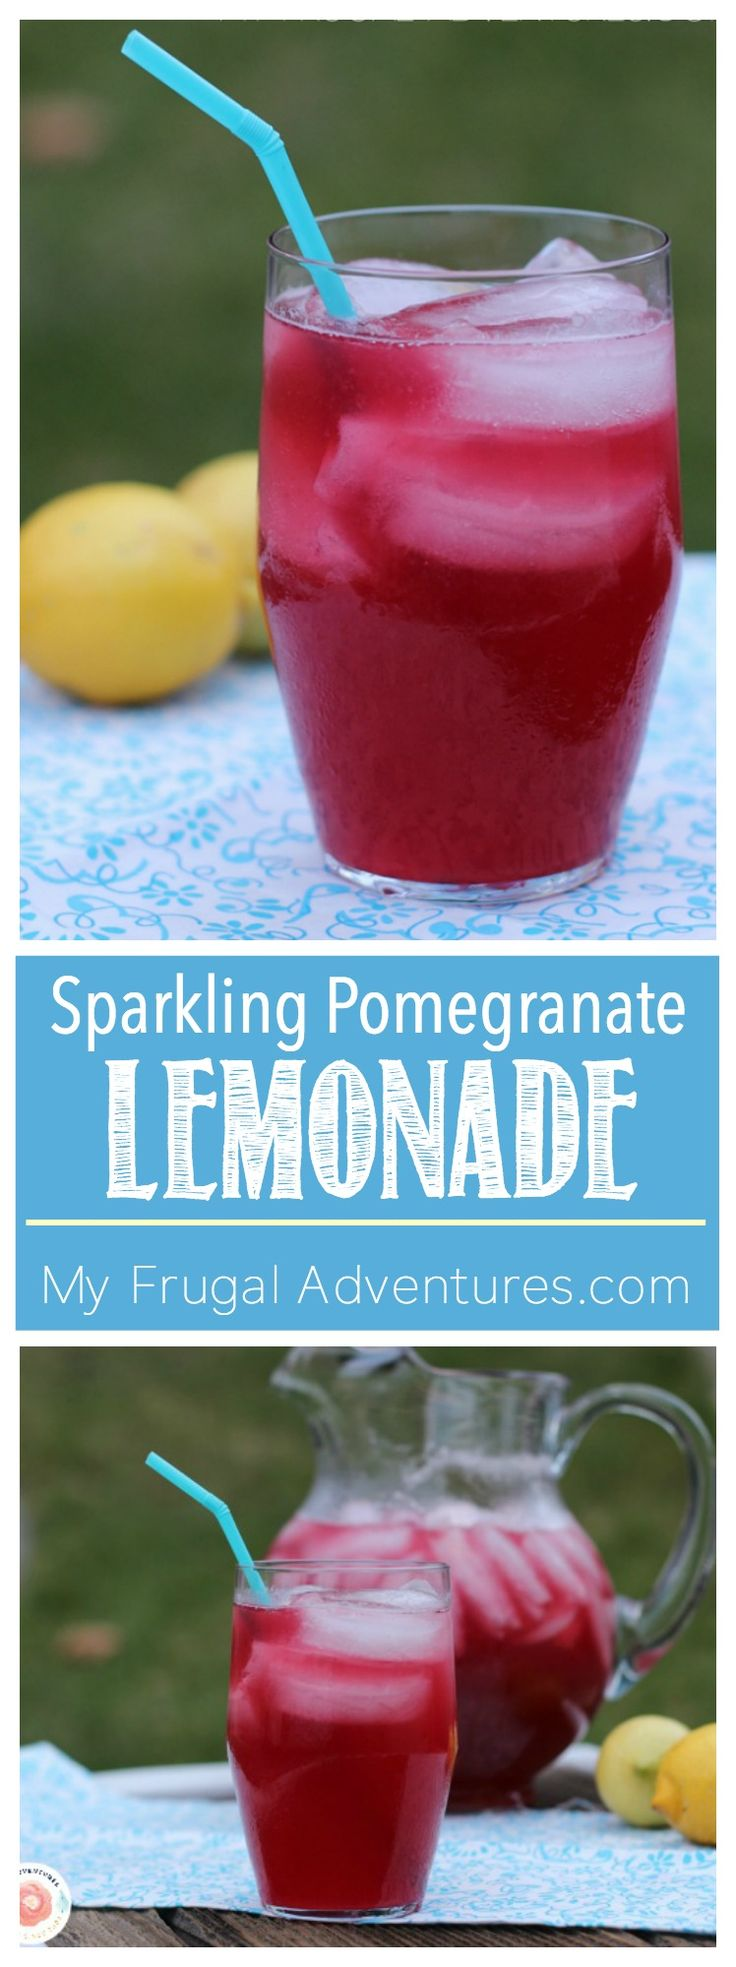 Super simple homemade Sparkling Pomegranate Lemonade recipe.  Absolutely perfect for summer entertaining!